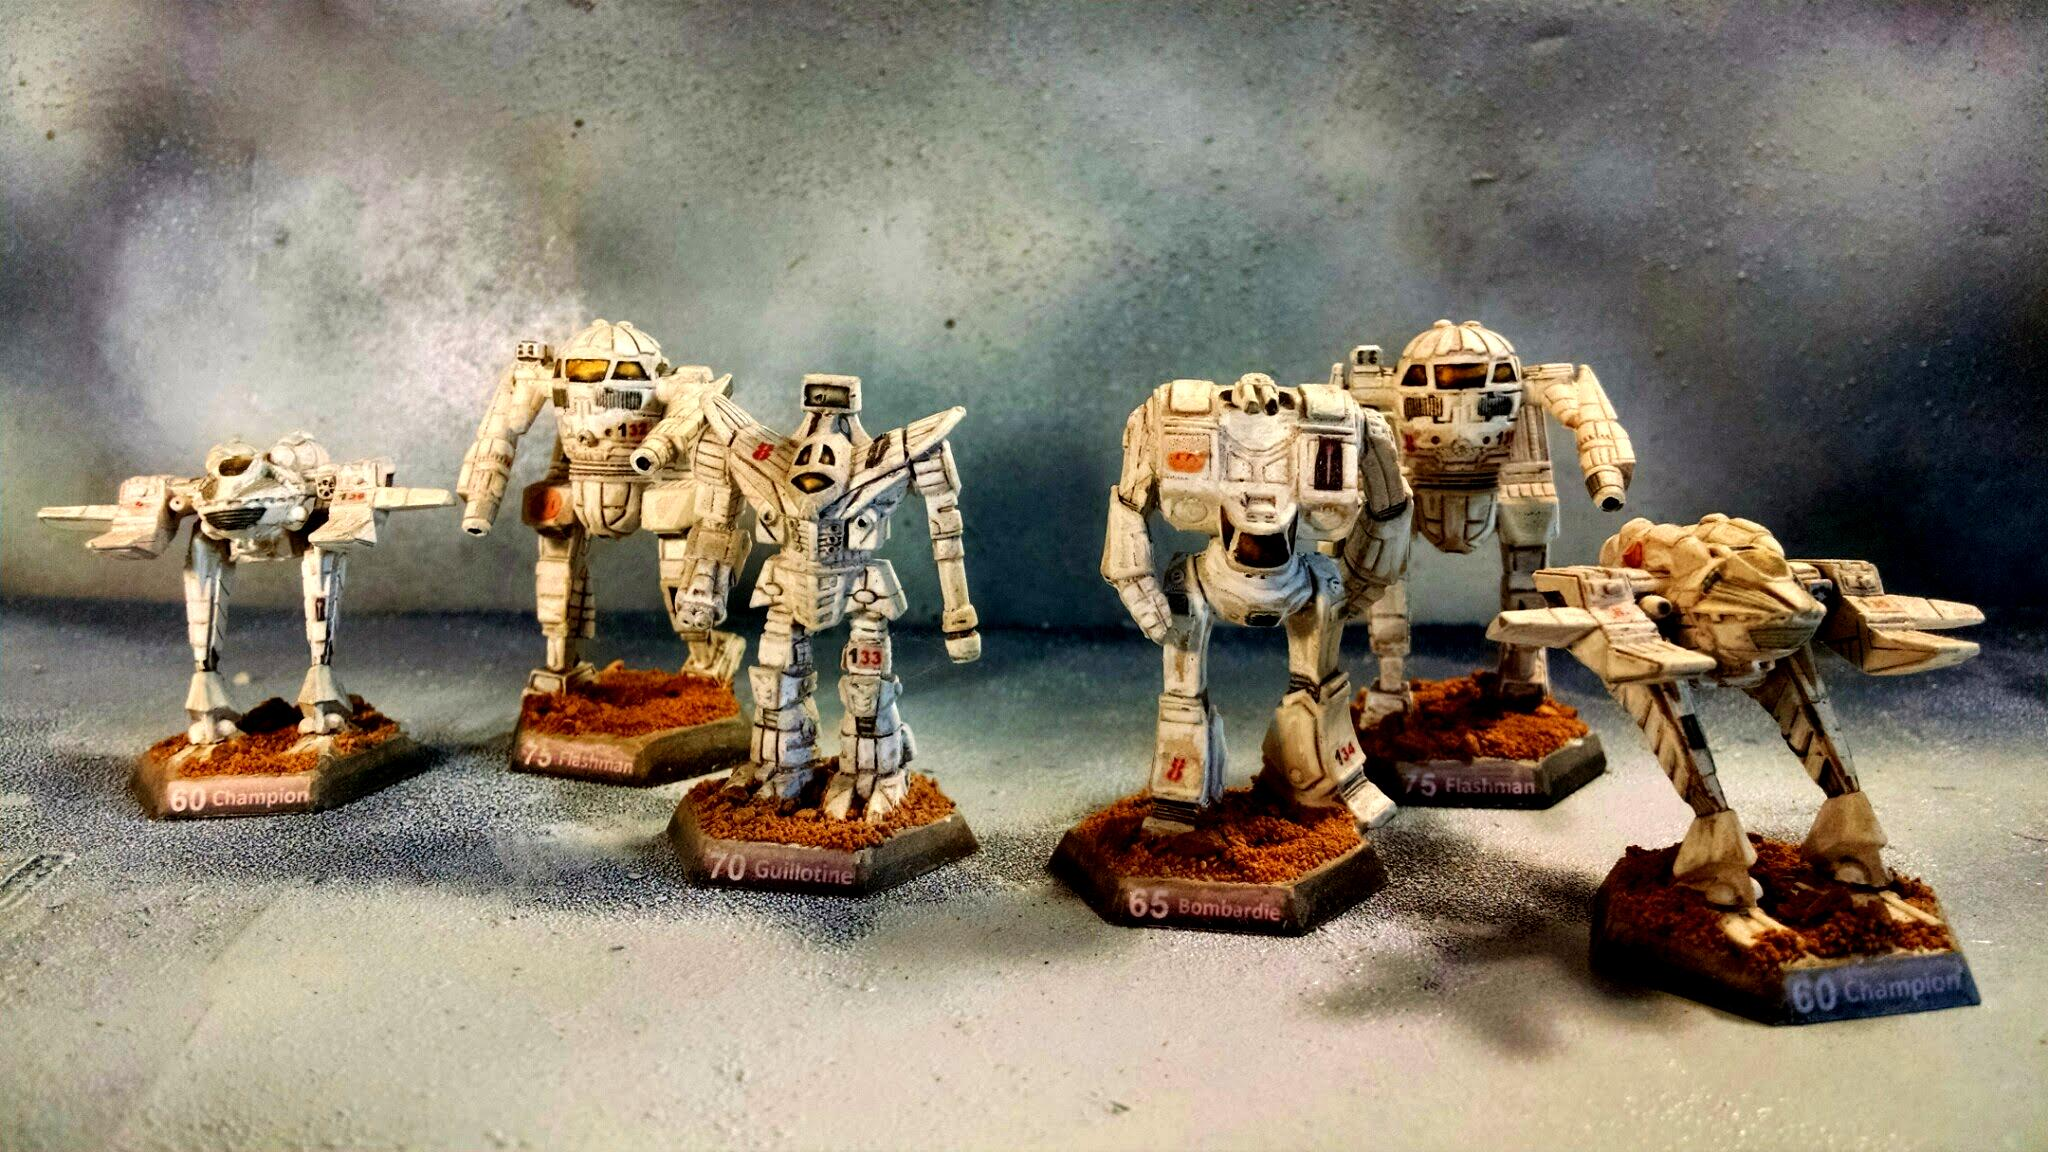 8th Division, Battletech, Bombardier, Champion, Flashman, Guillotine, Mechs, Wob, Word Of Blake